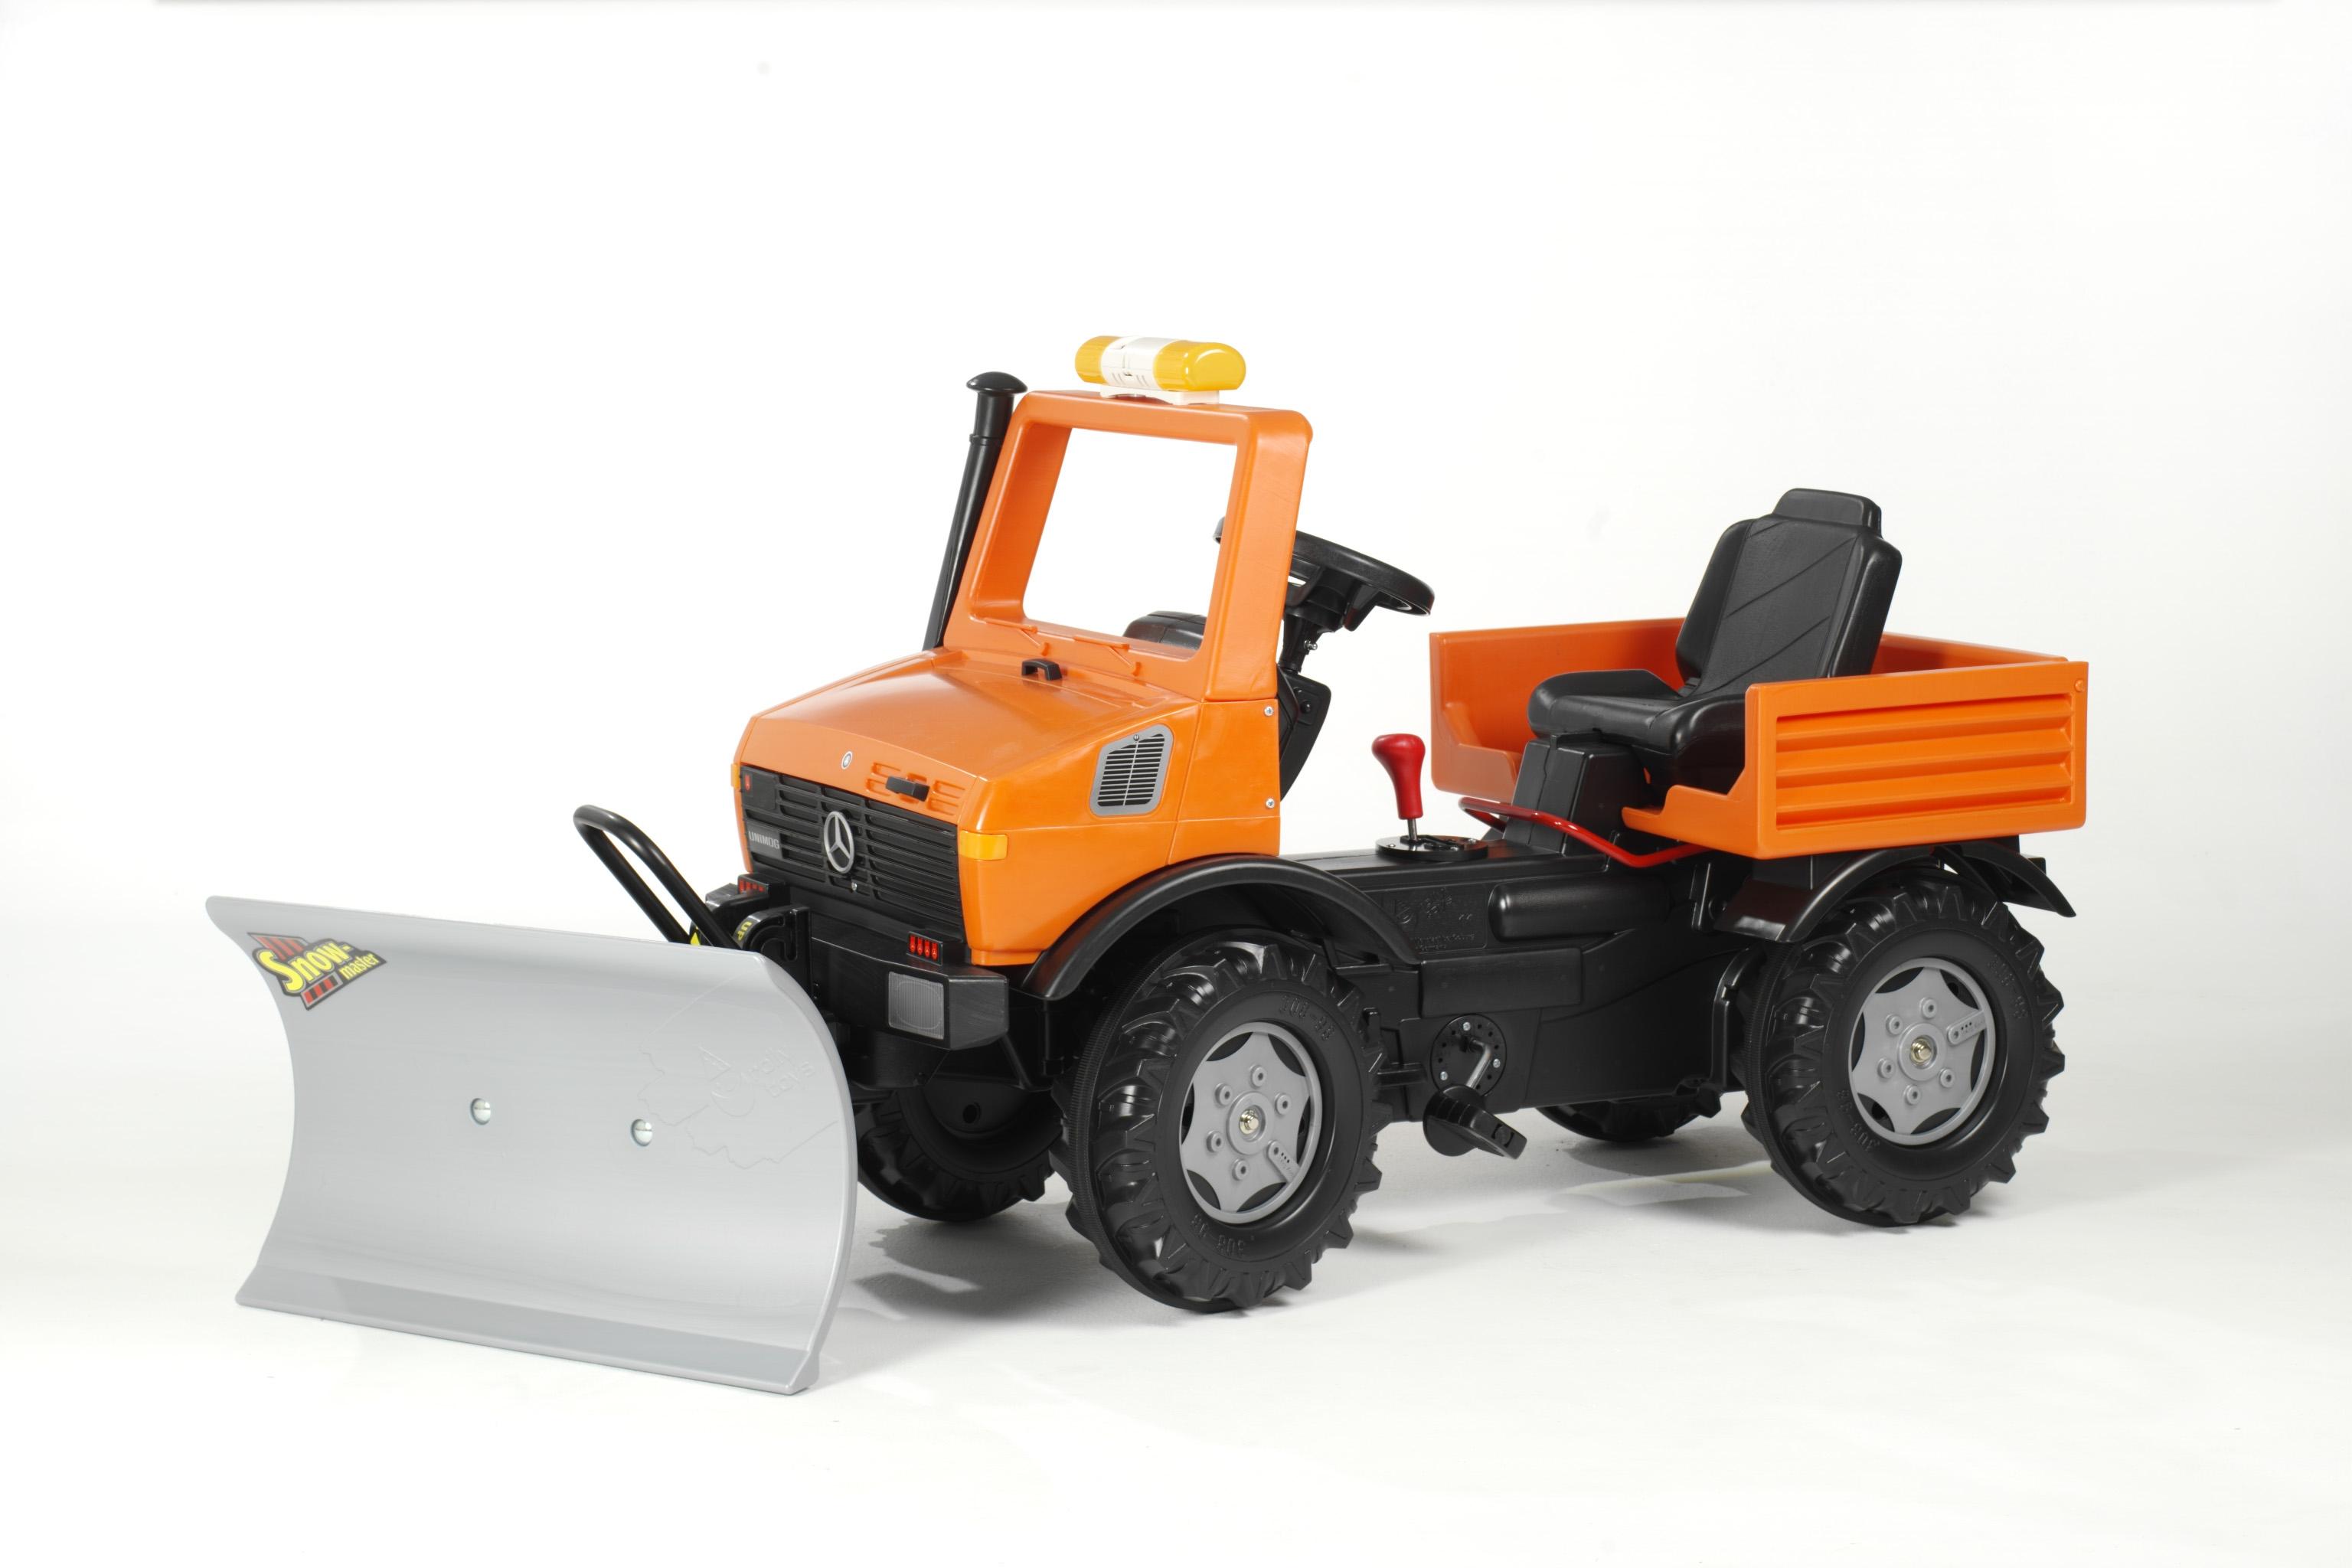 rolly toys unimog orange kommunal mit schneepflug. Black Bedroom Furniture Sets. Home Design Ideas